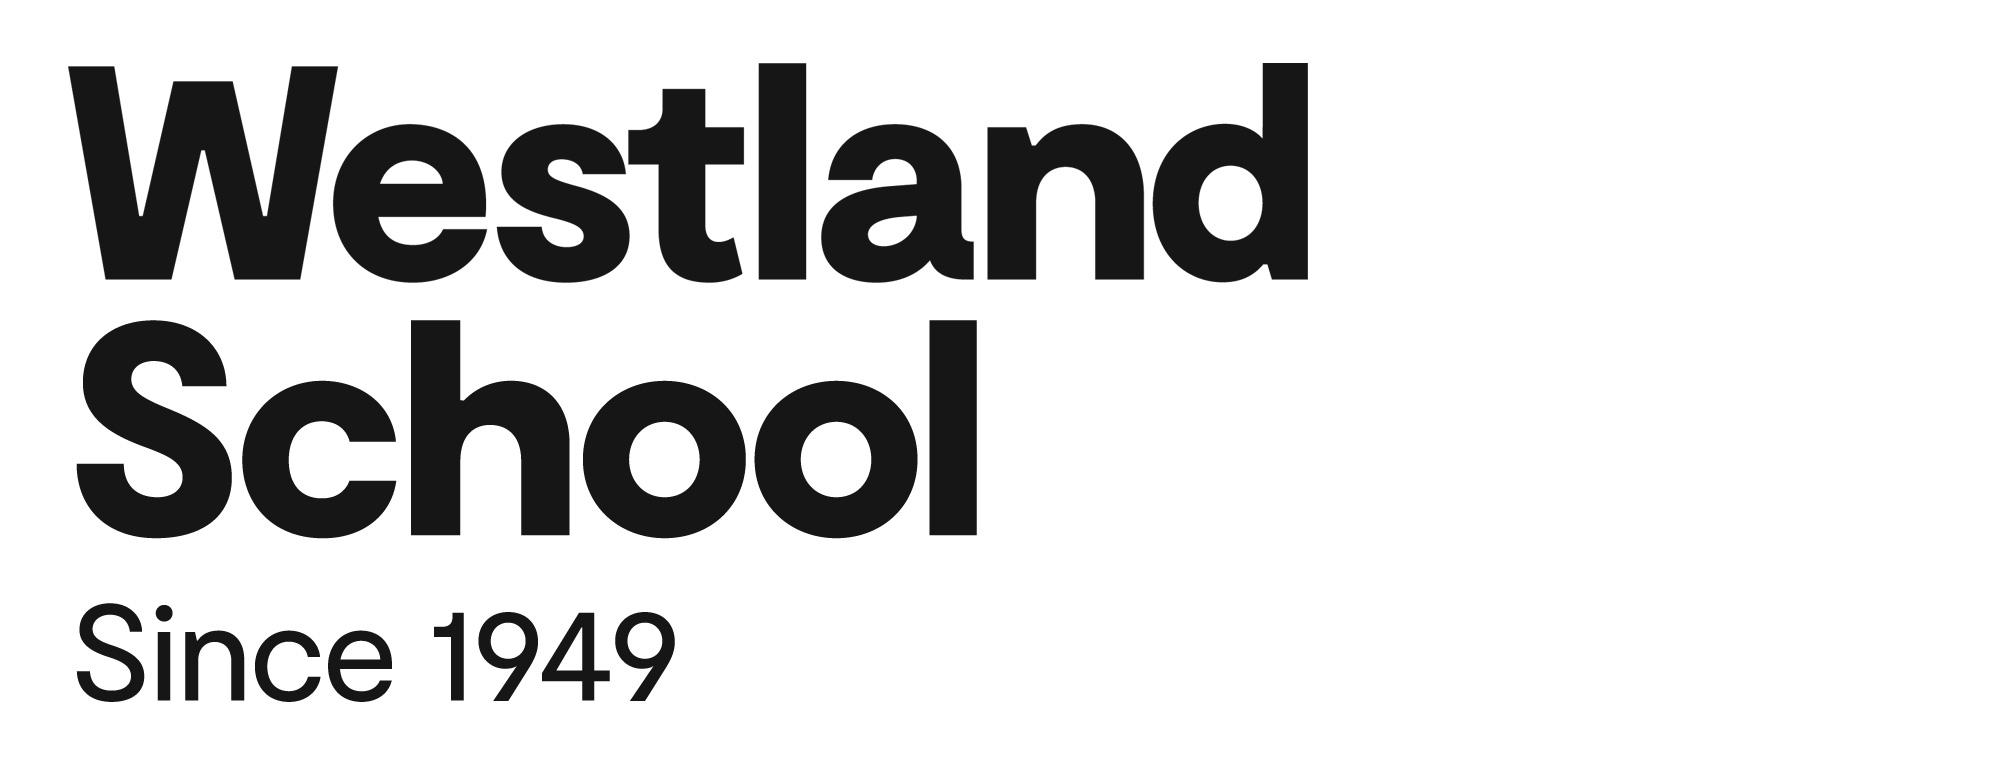 distinc_portfolio_westland_school_logo1.jpg